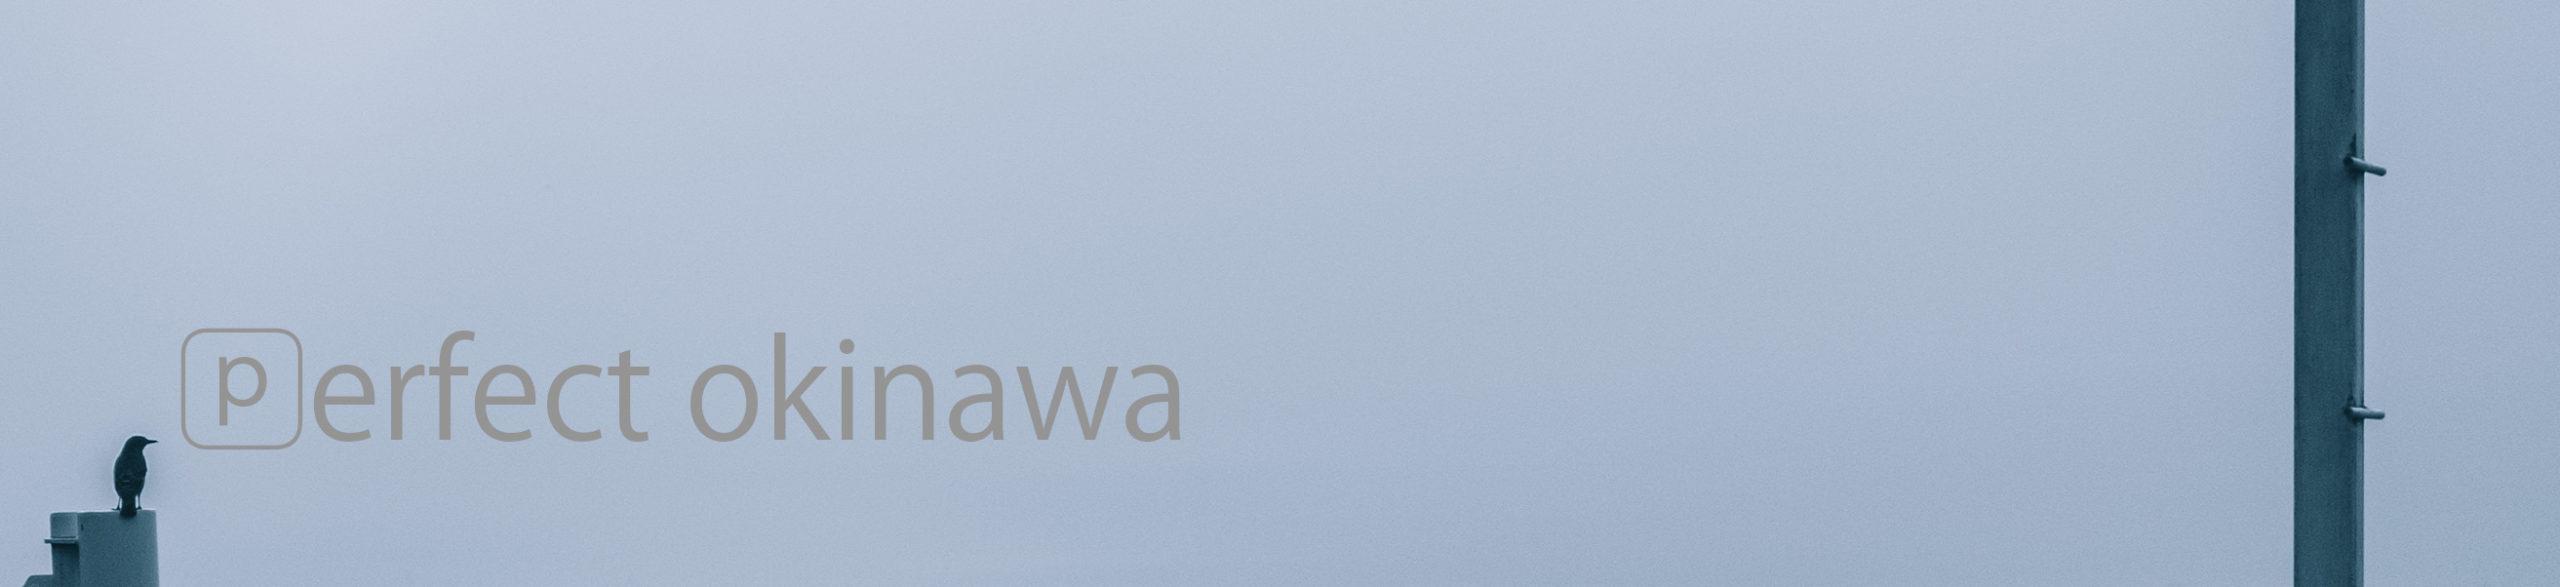 perfect okinawa